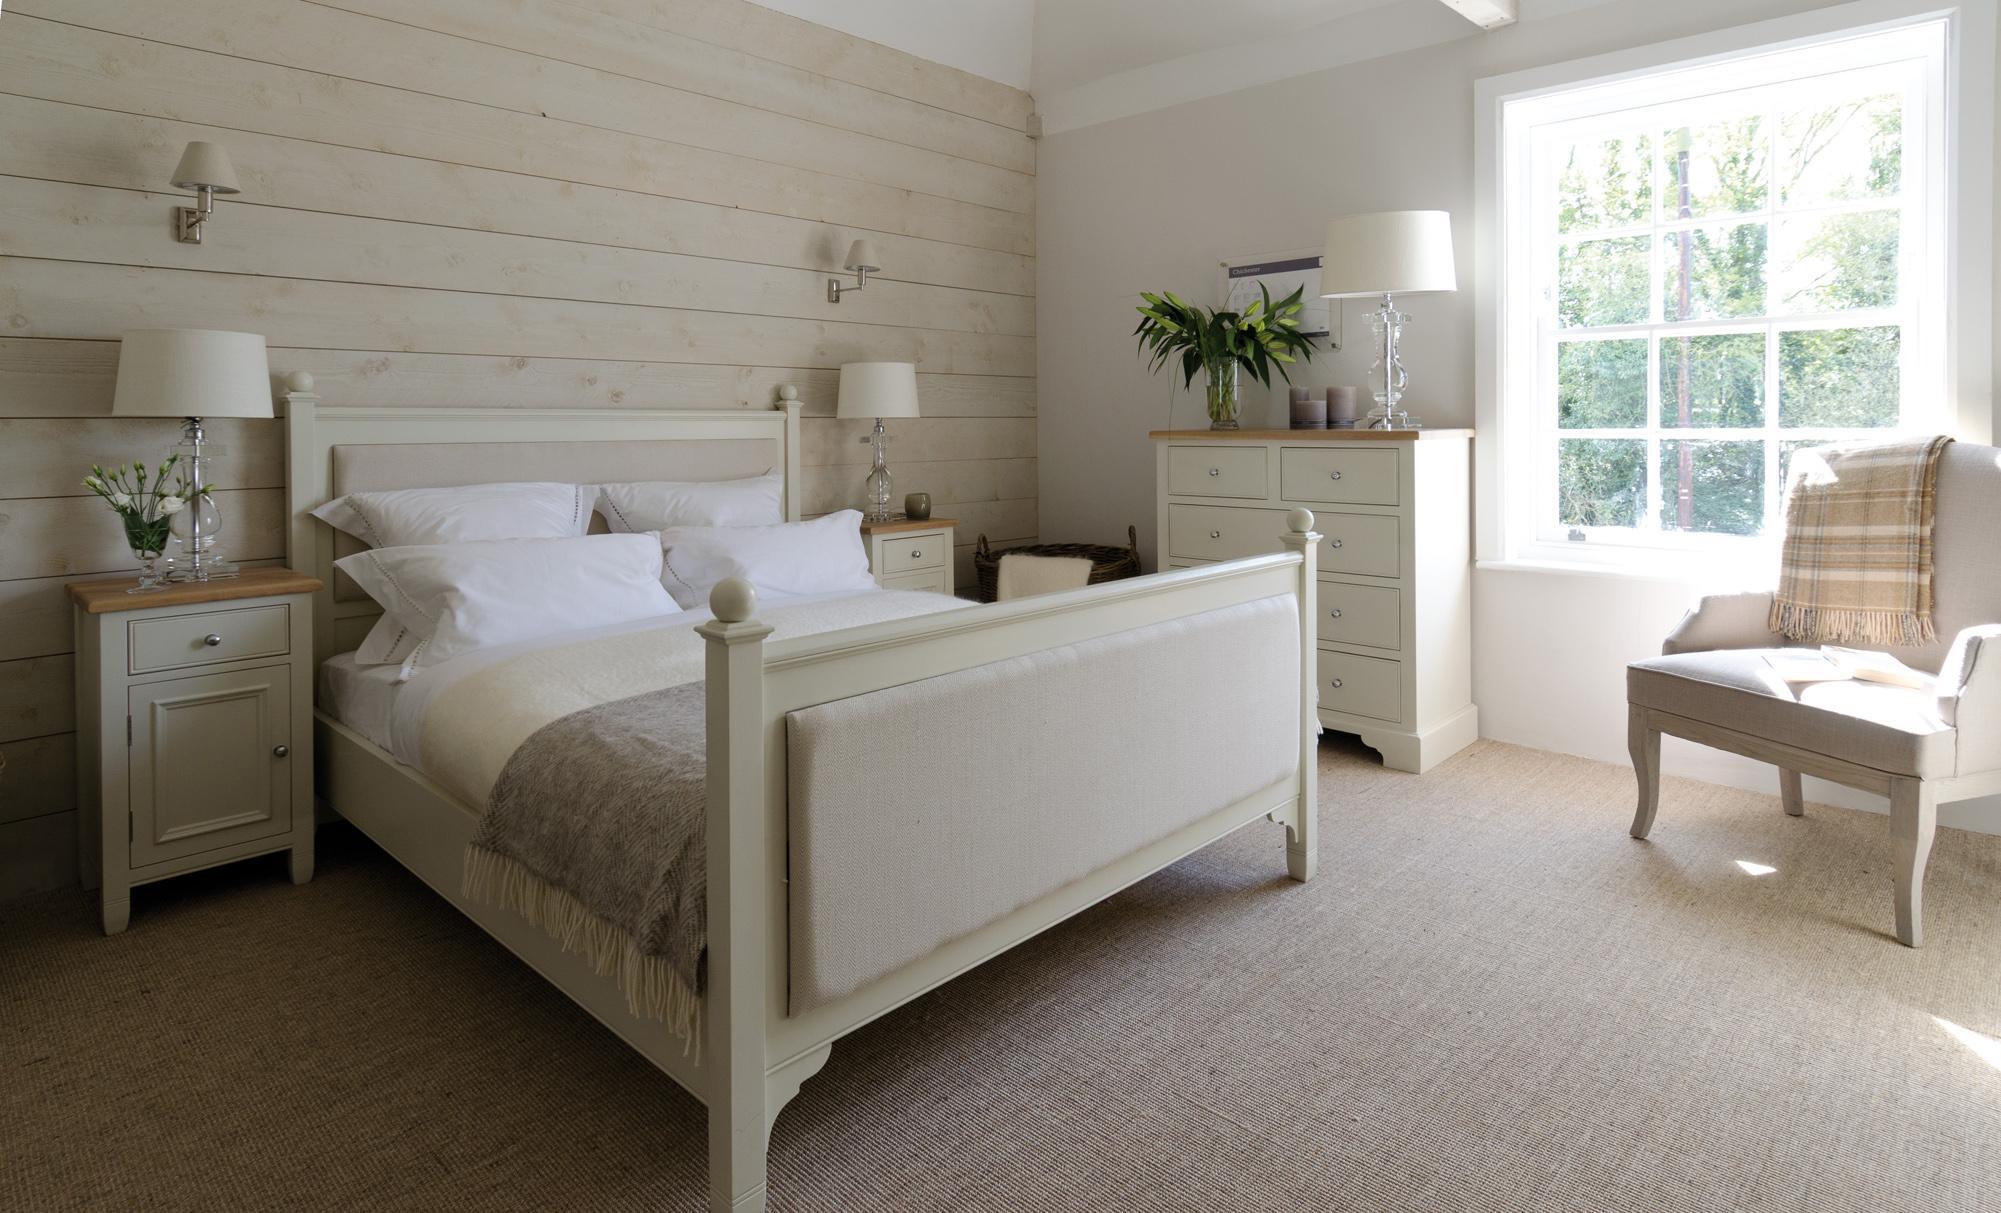 Schlafzimmerbeleuchtung gestalten: Ideen bei COUCH!